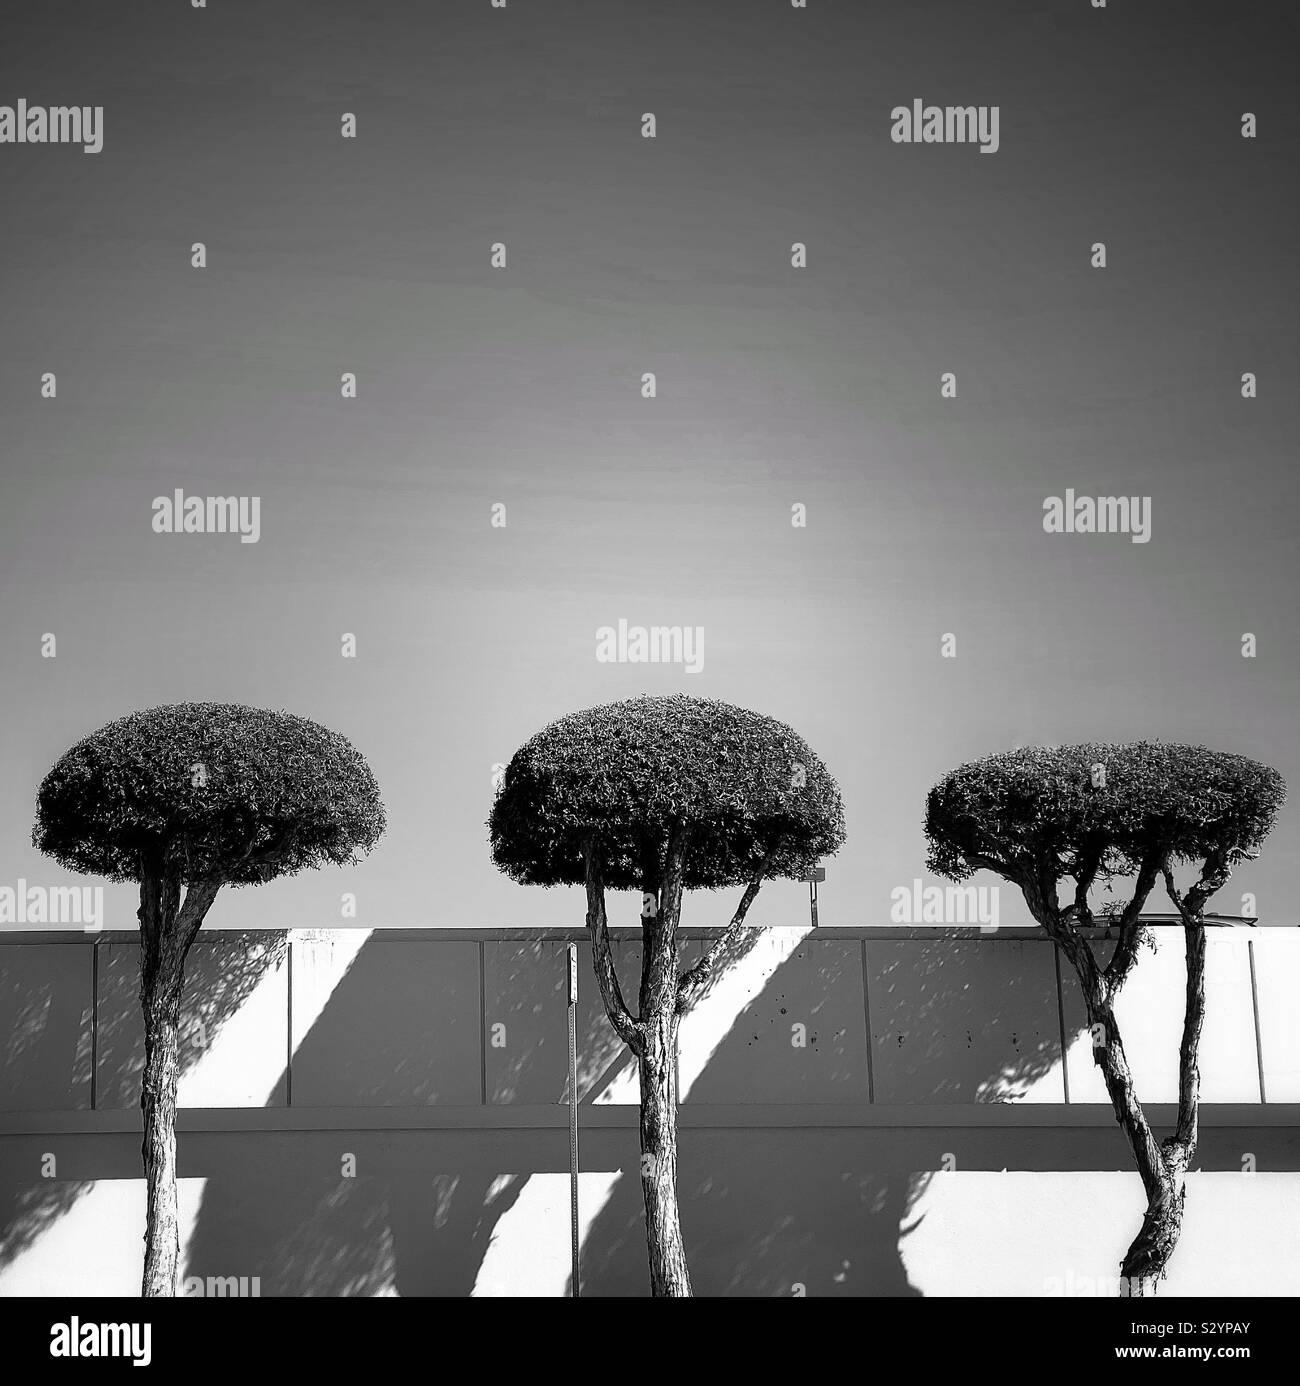 Three trees lined up along a city wall Stock Photo